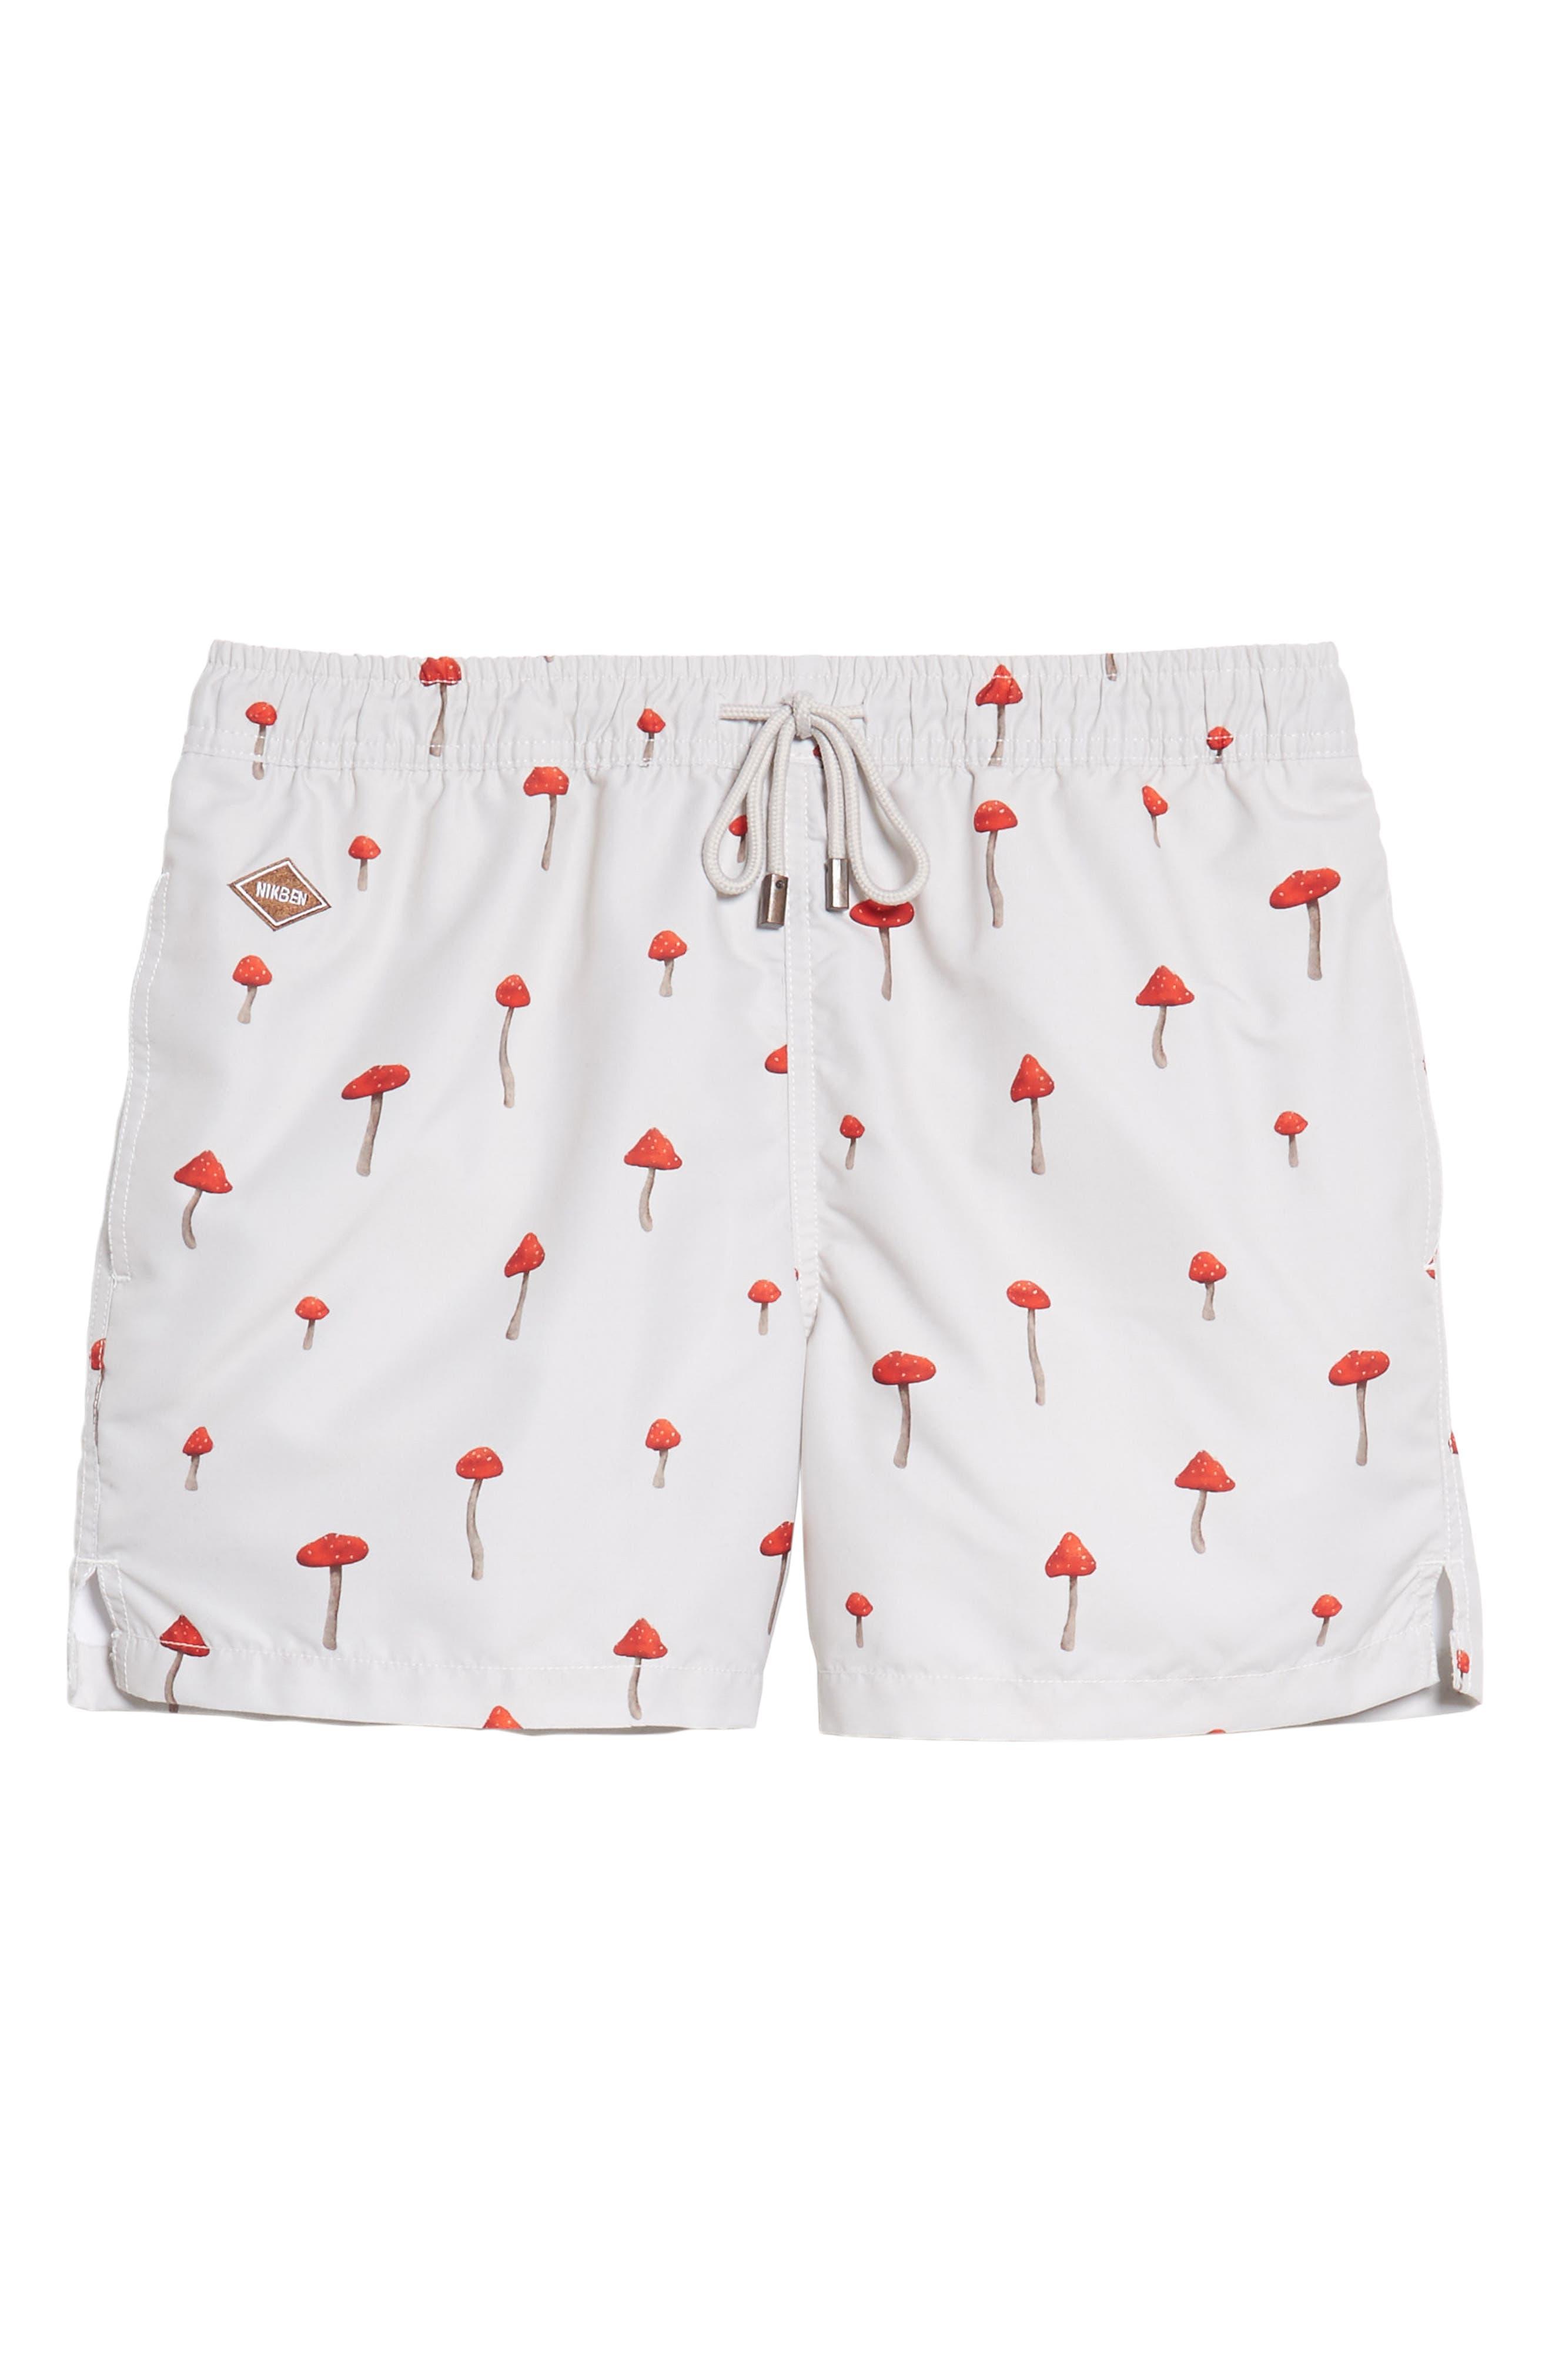 Moshi Moshi Board Shorts,                             Alternate thumbnail 6, color,                             Off White